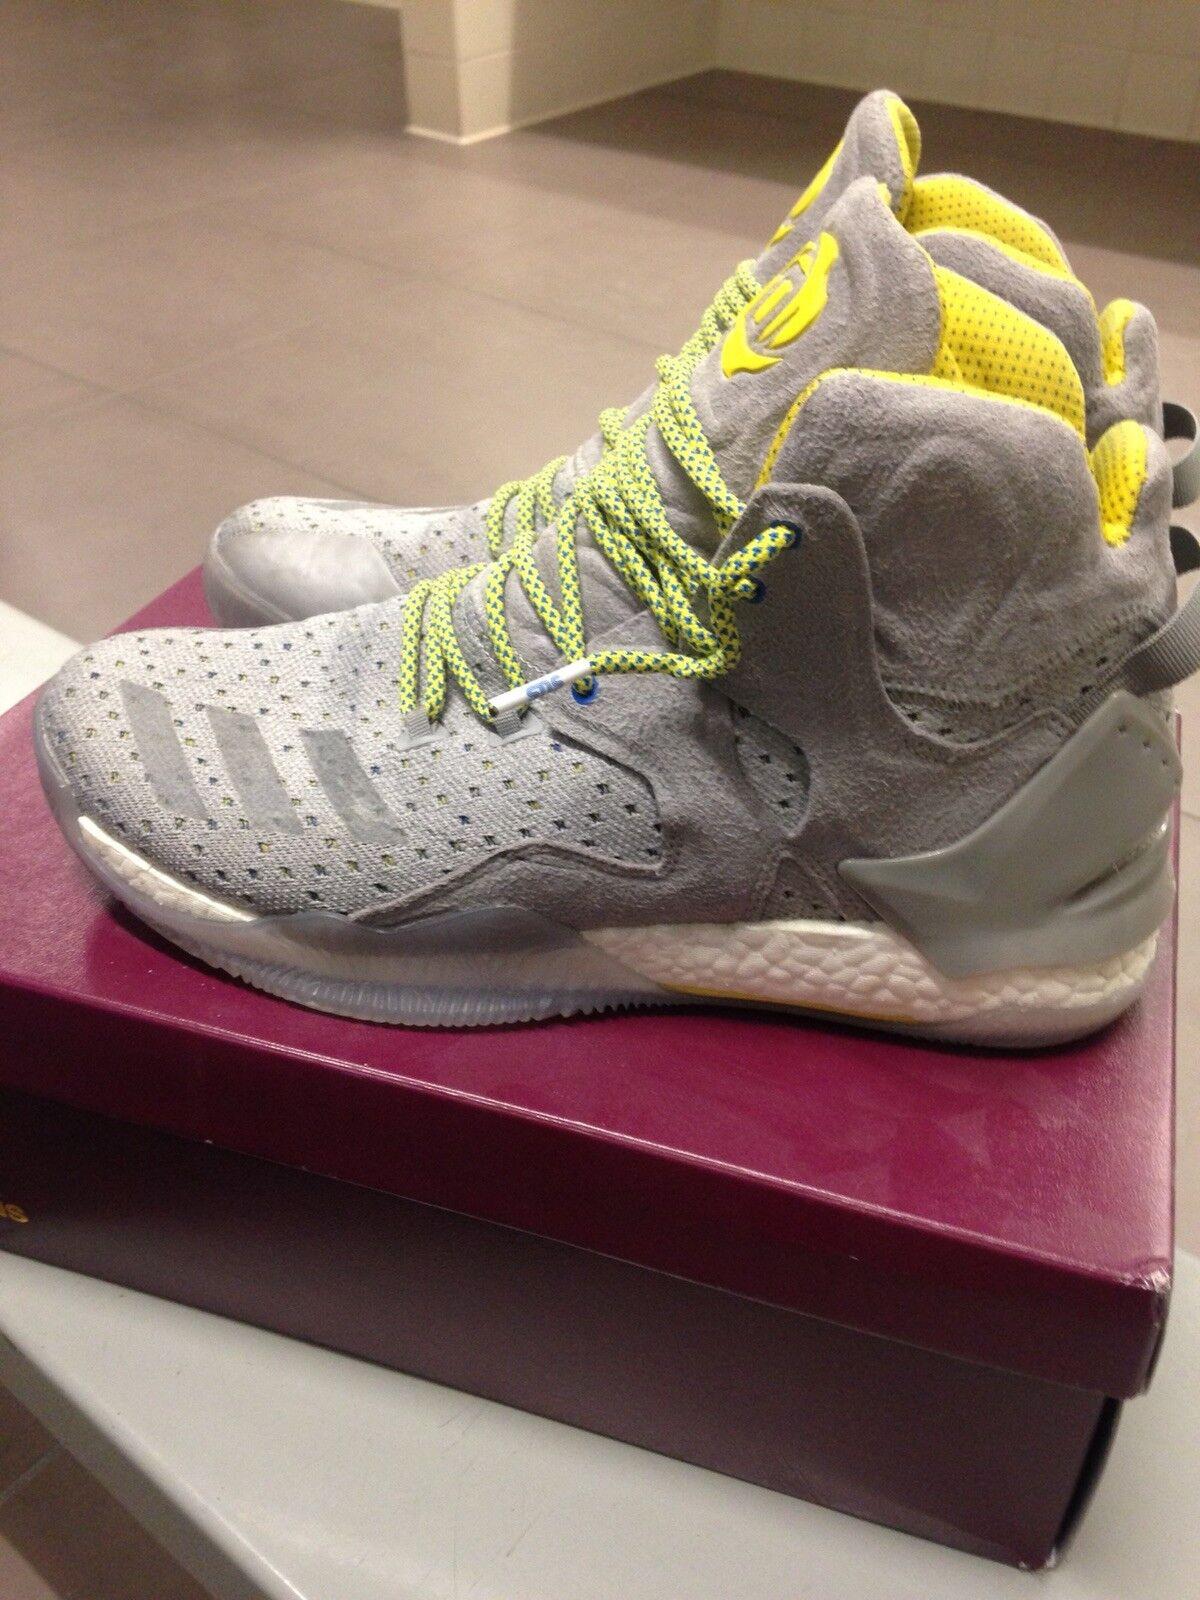 Adidas SNS Sneakers N Stuff Dpink VII Boost Primeknit SZ 9 1 2